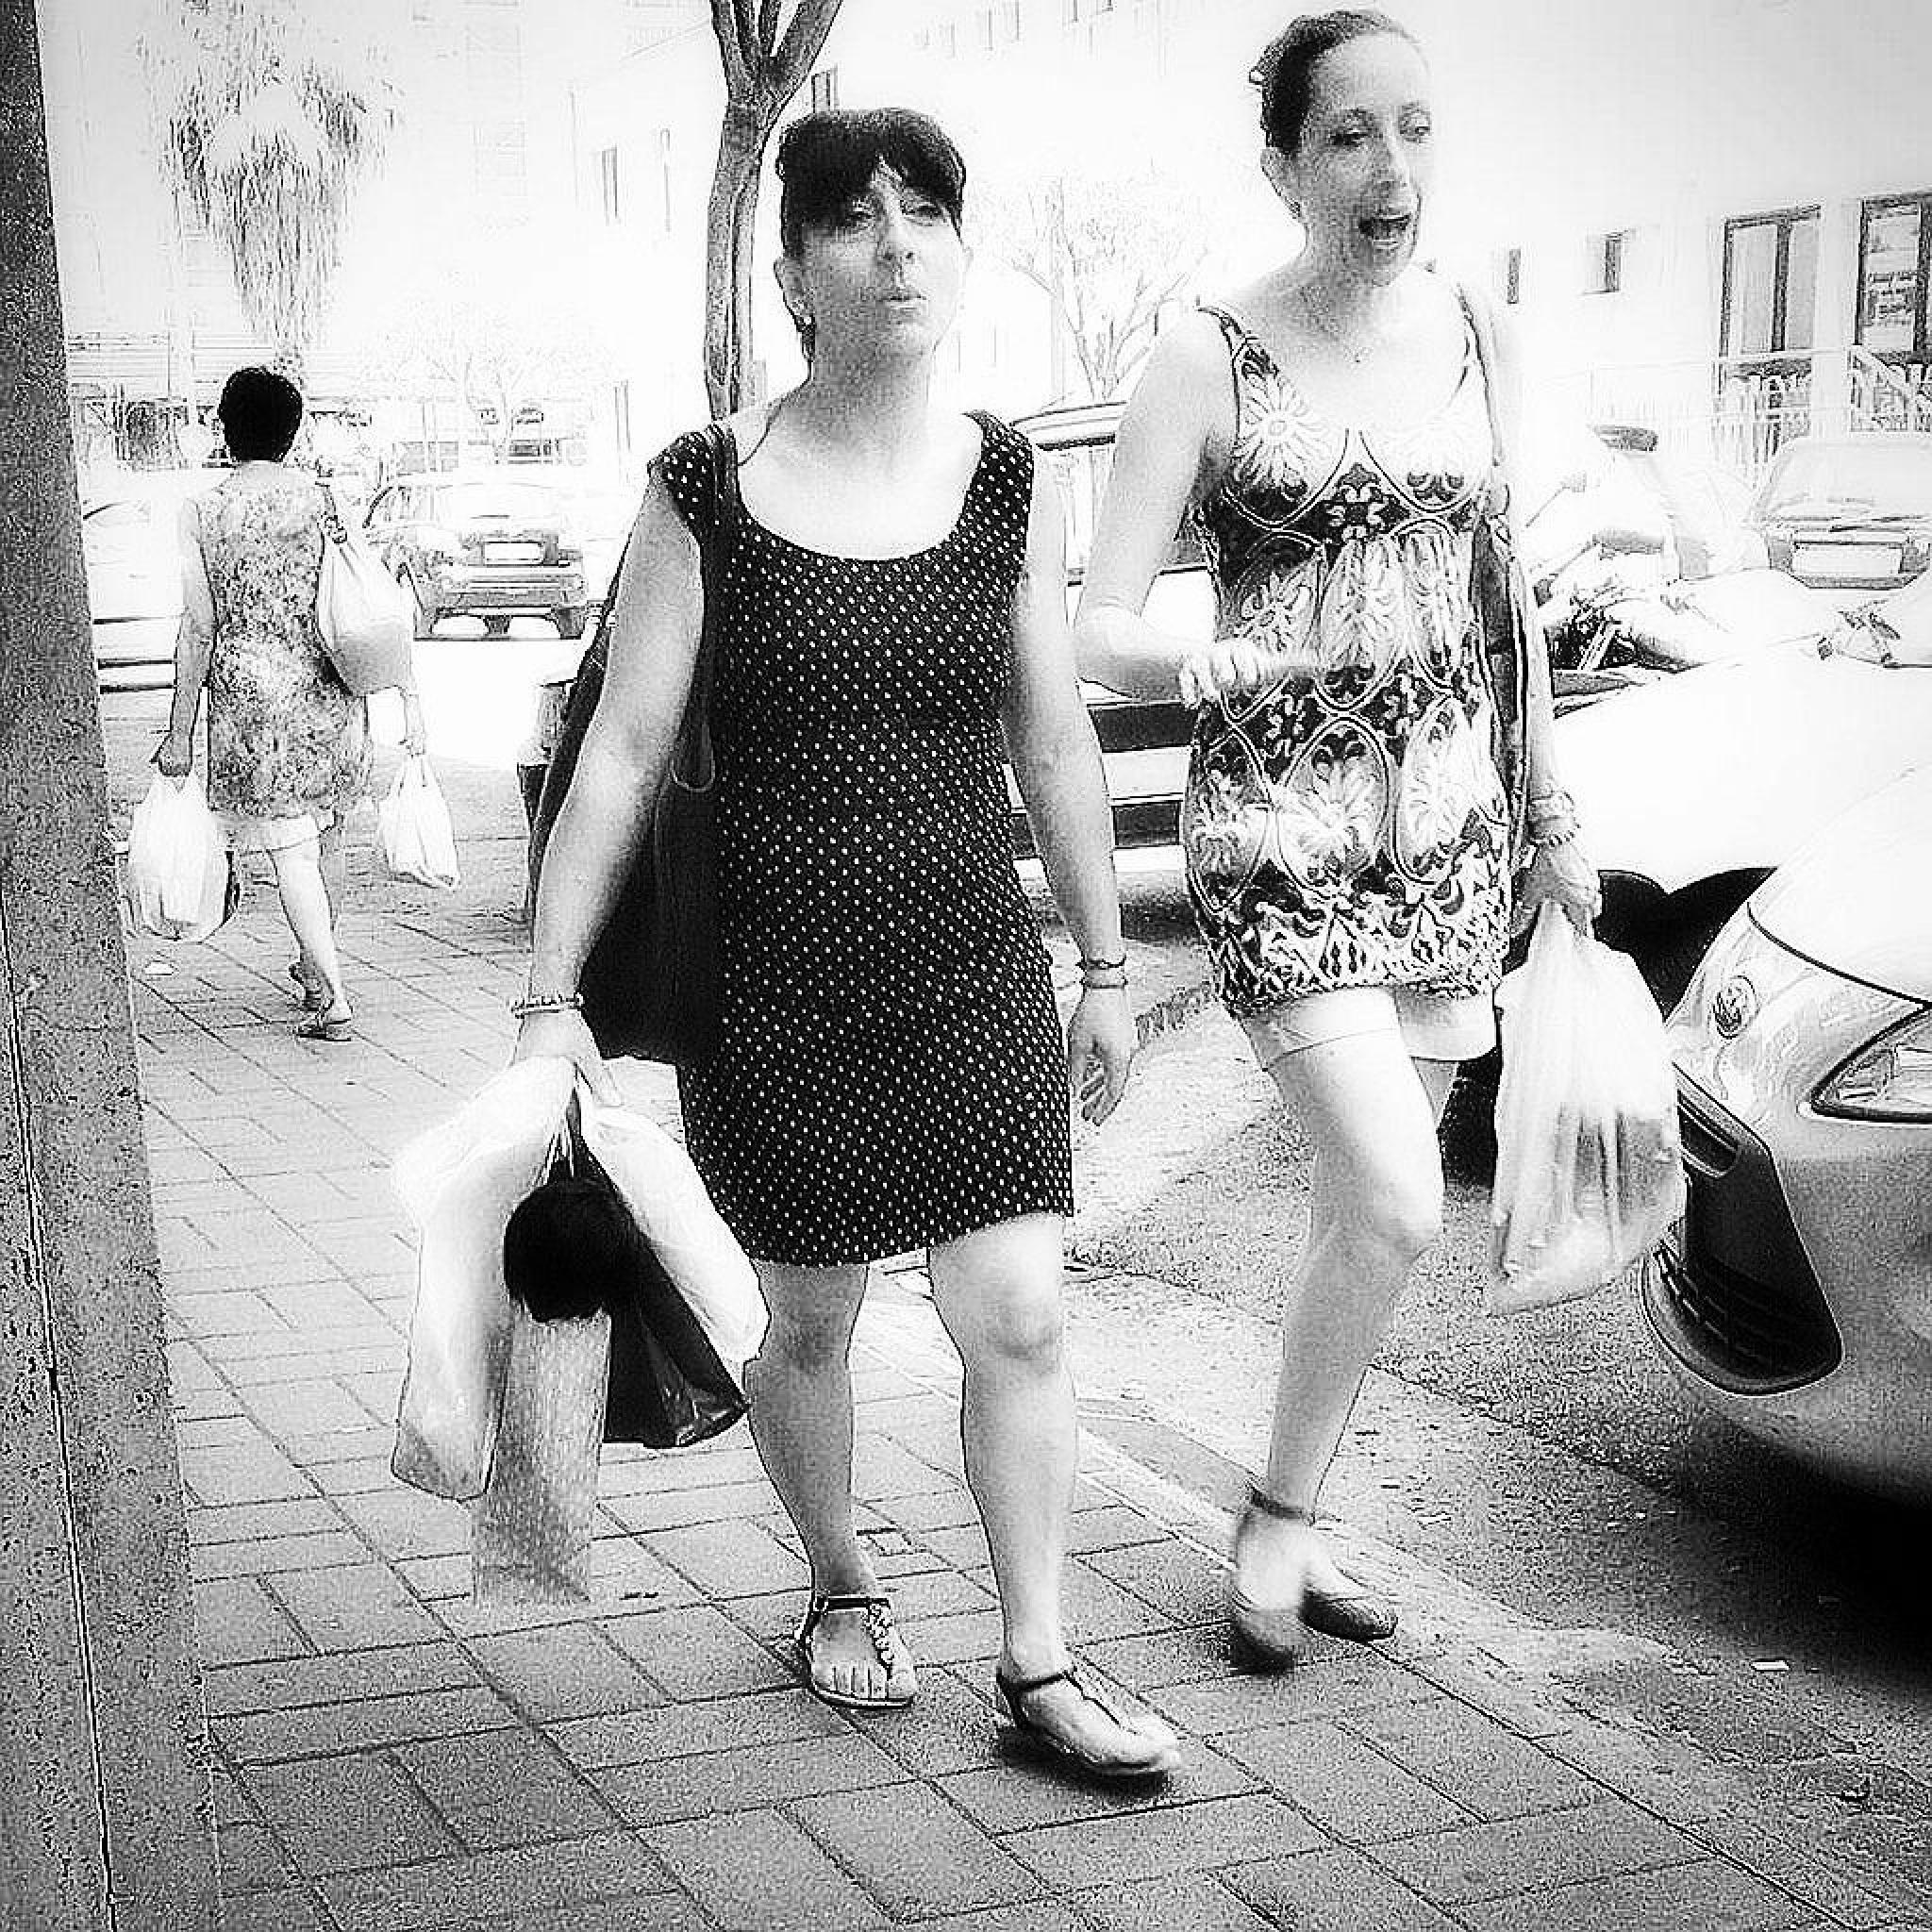 street photographer by Mario photo